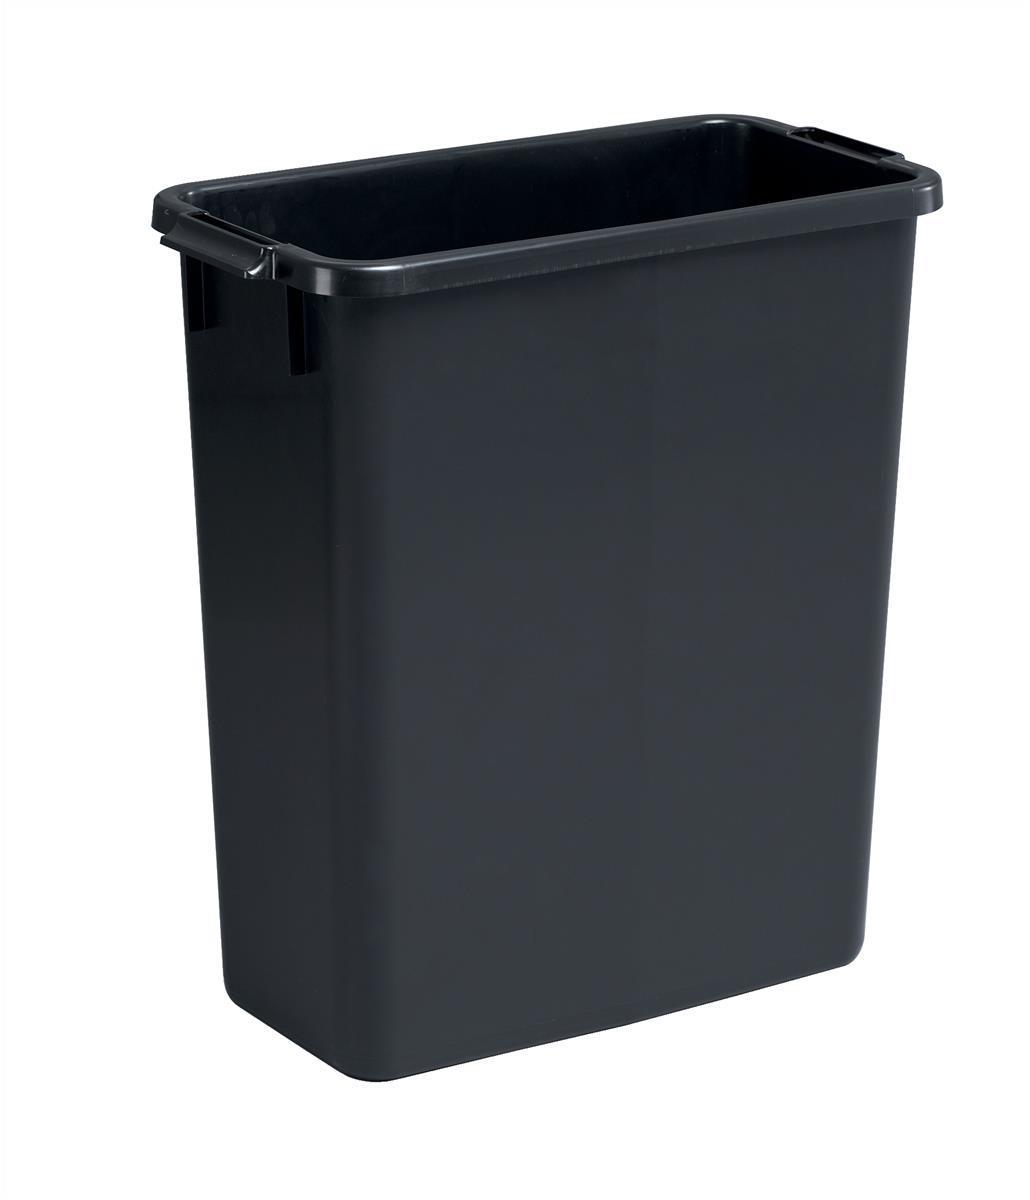 Image for Durable Durabin Slim Bin 60 Litres Black Ref S10496221 Ref 1800496221